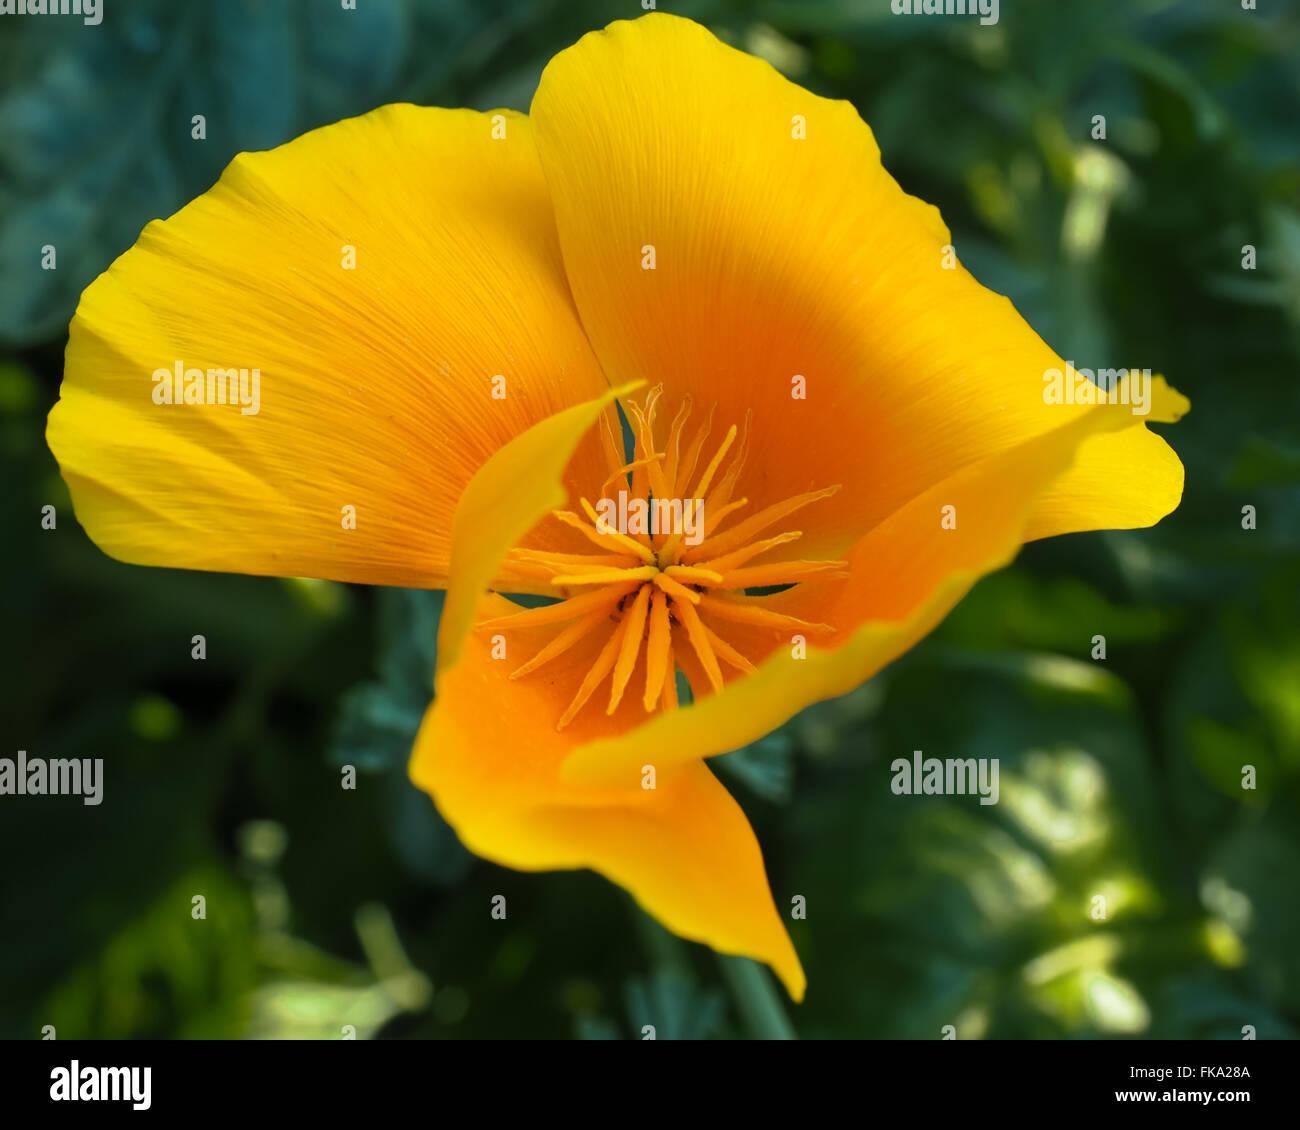 California Poppy Golden Yellow Inside - Stock Image